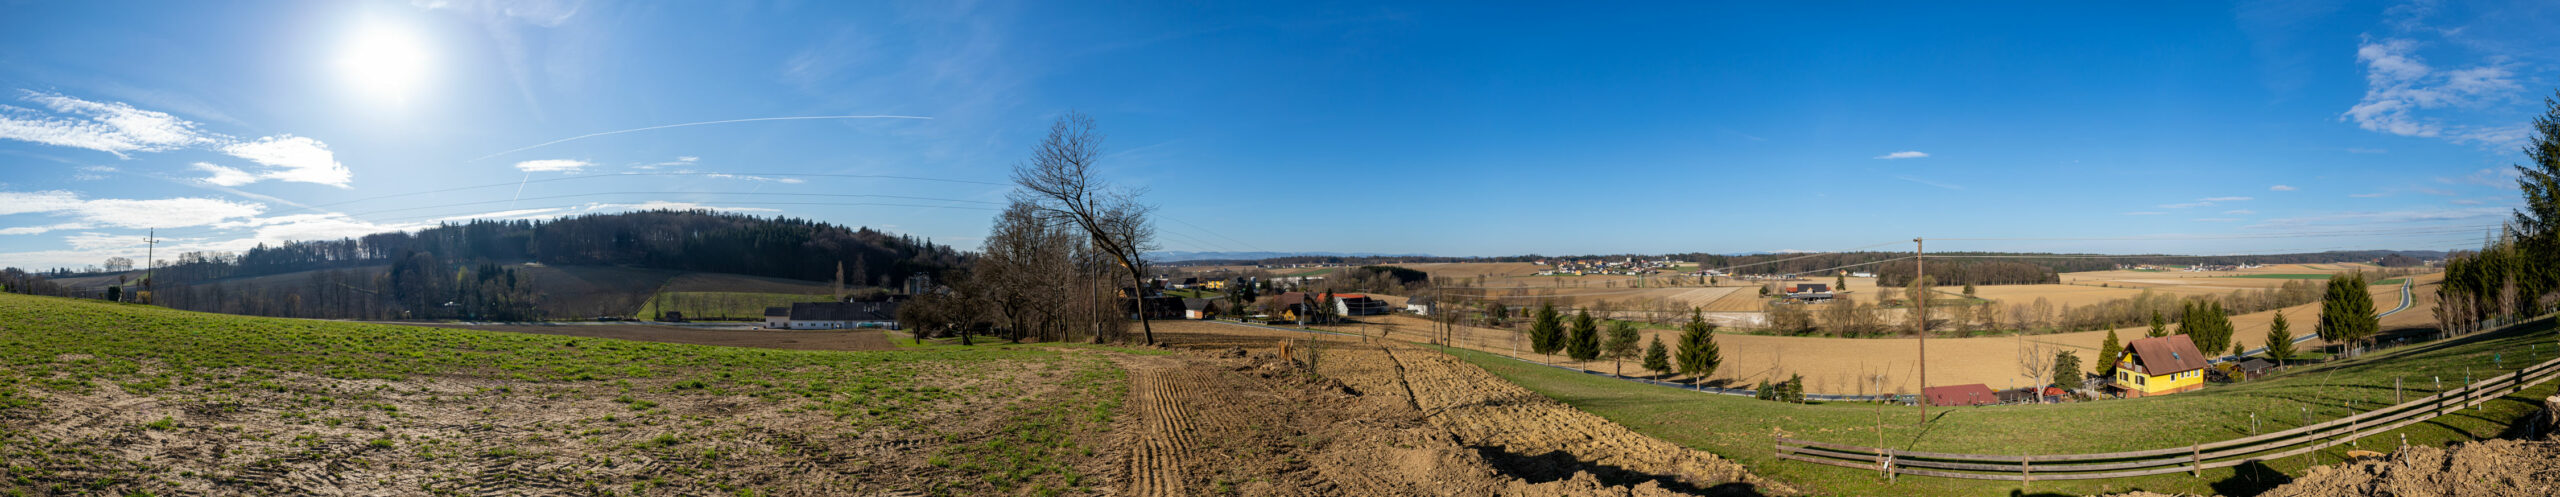 Panoramafoto Steiraöl Gelände